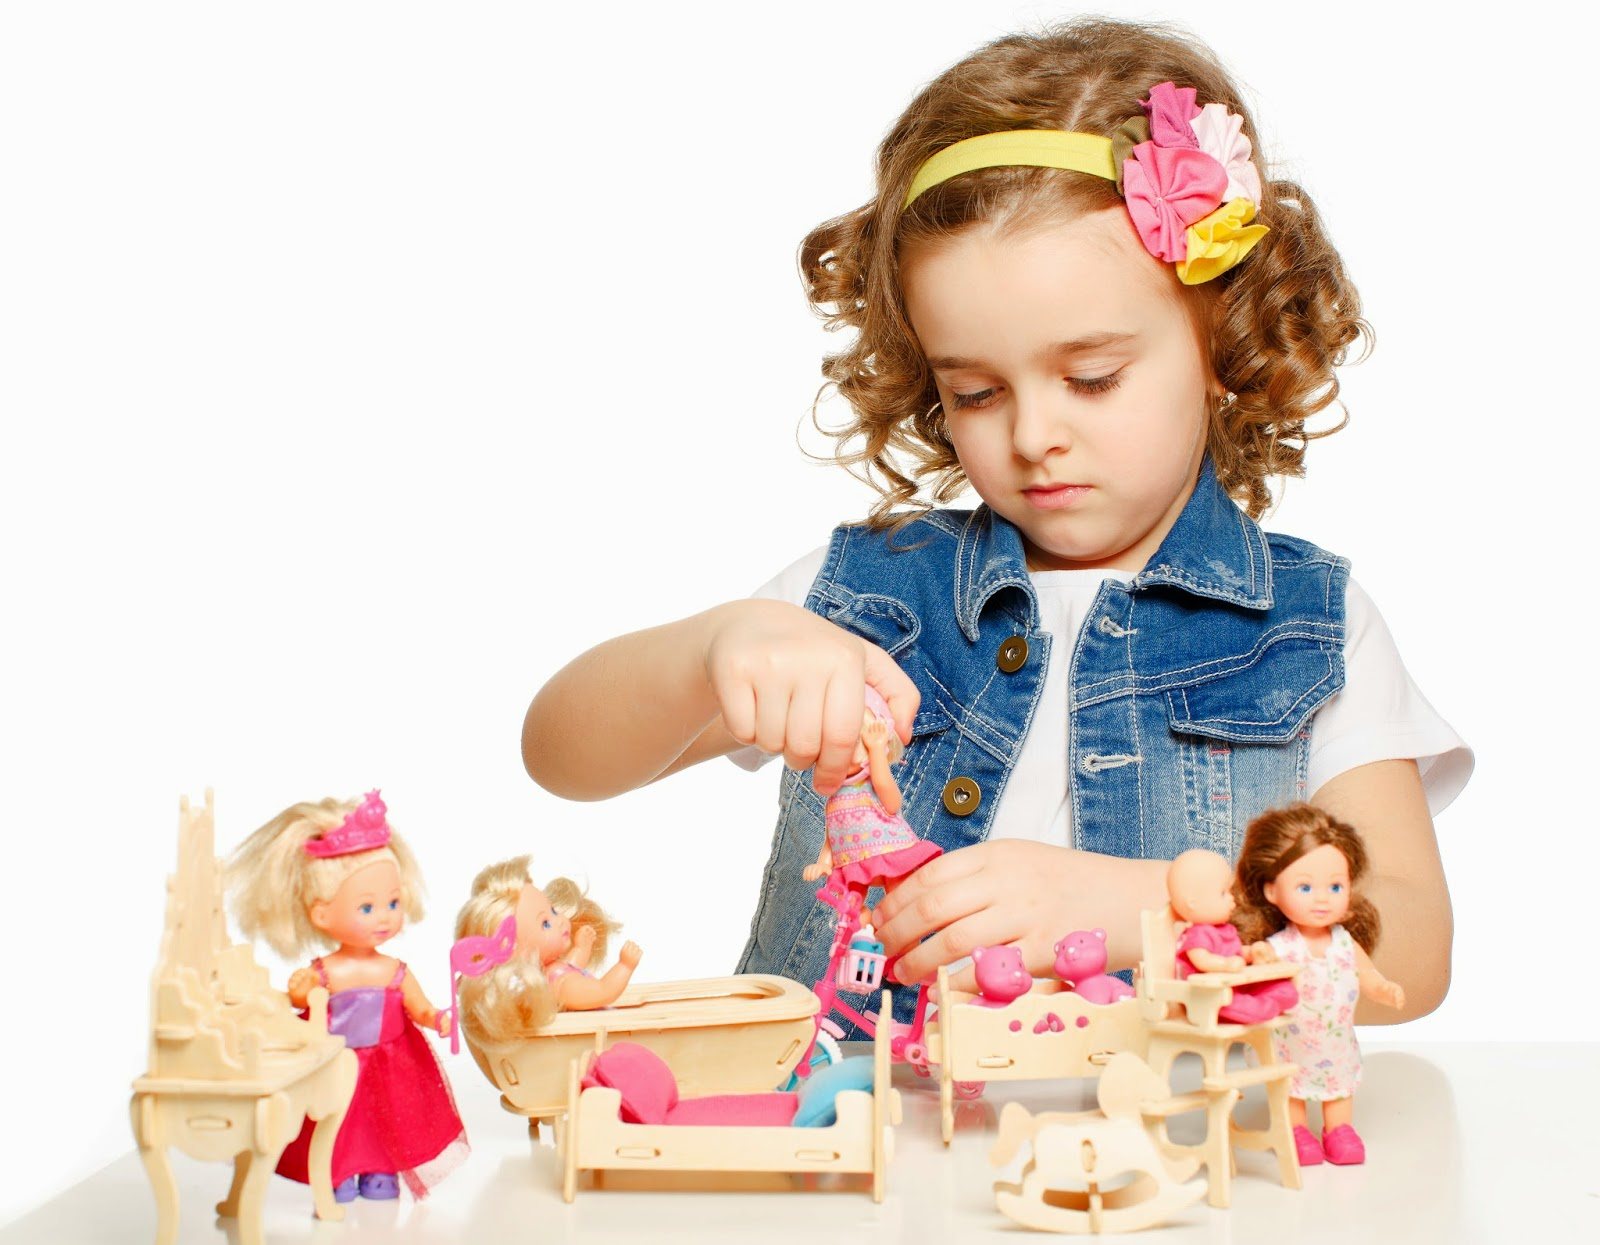 The Developmental Progression of Play Skills